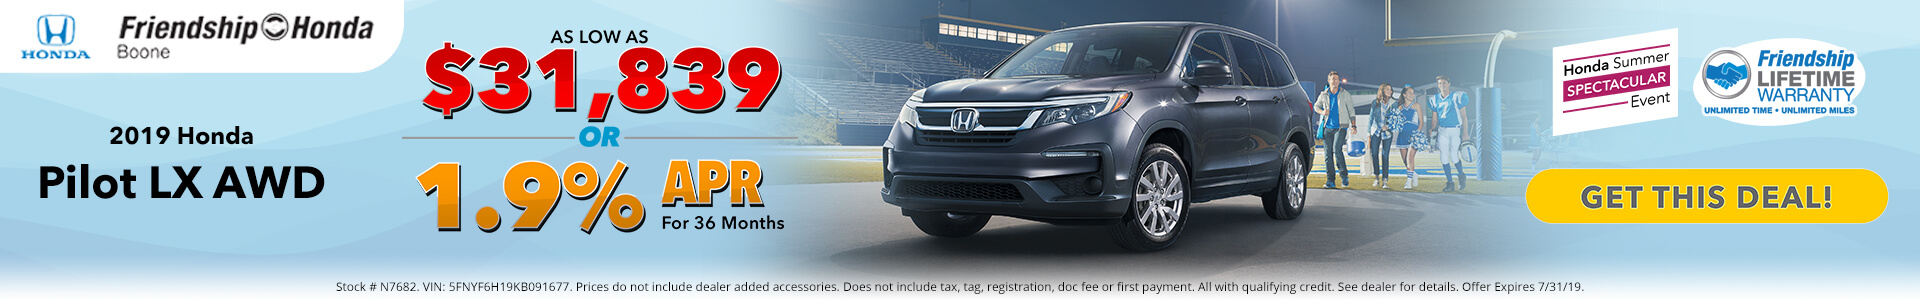 Honda Pilot $31,839 Purchase